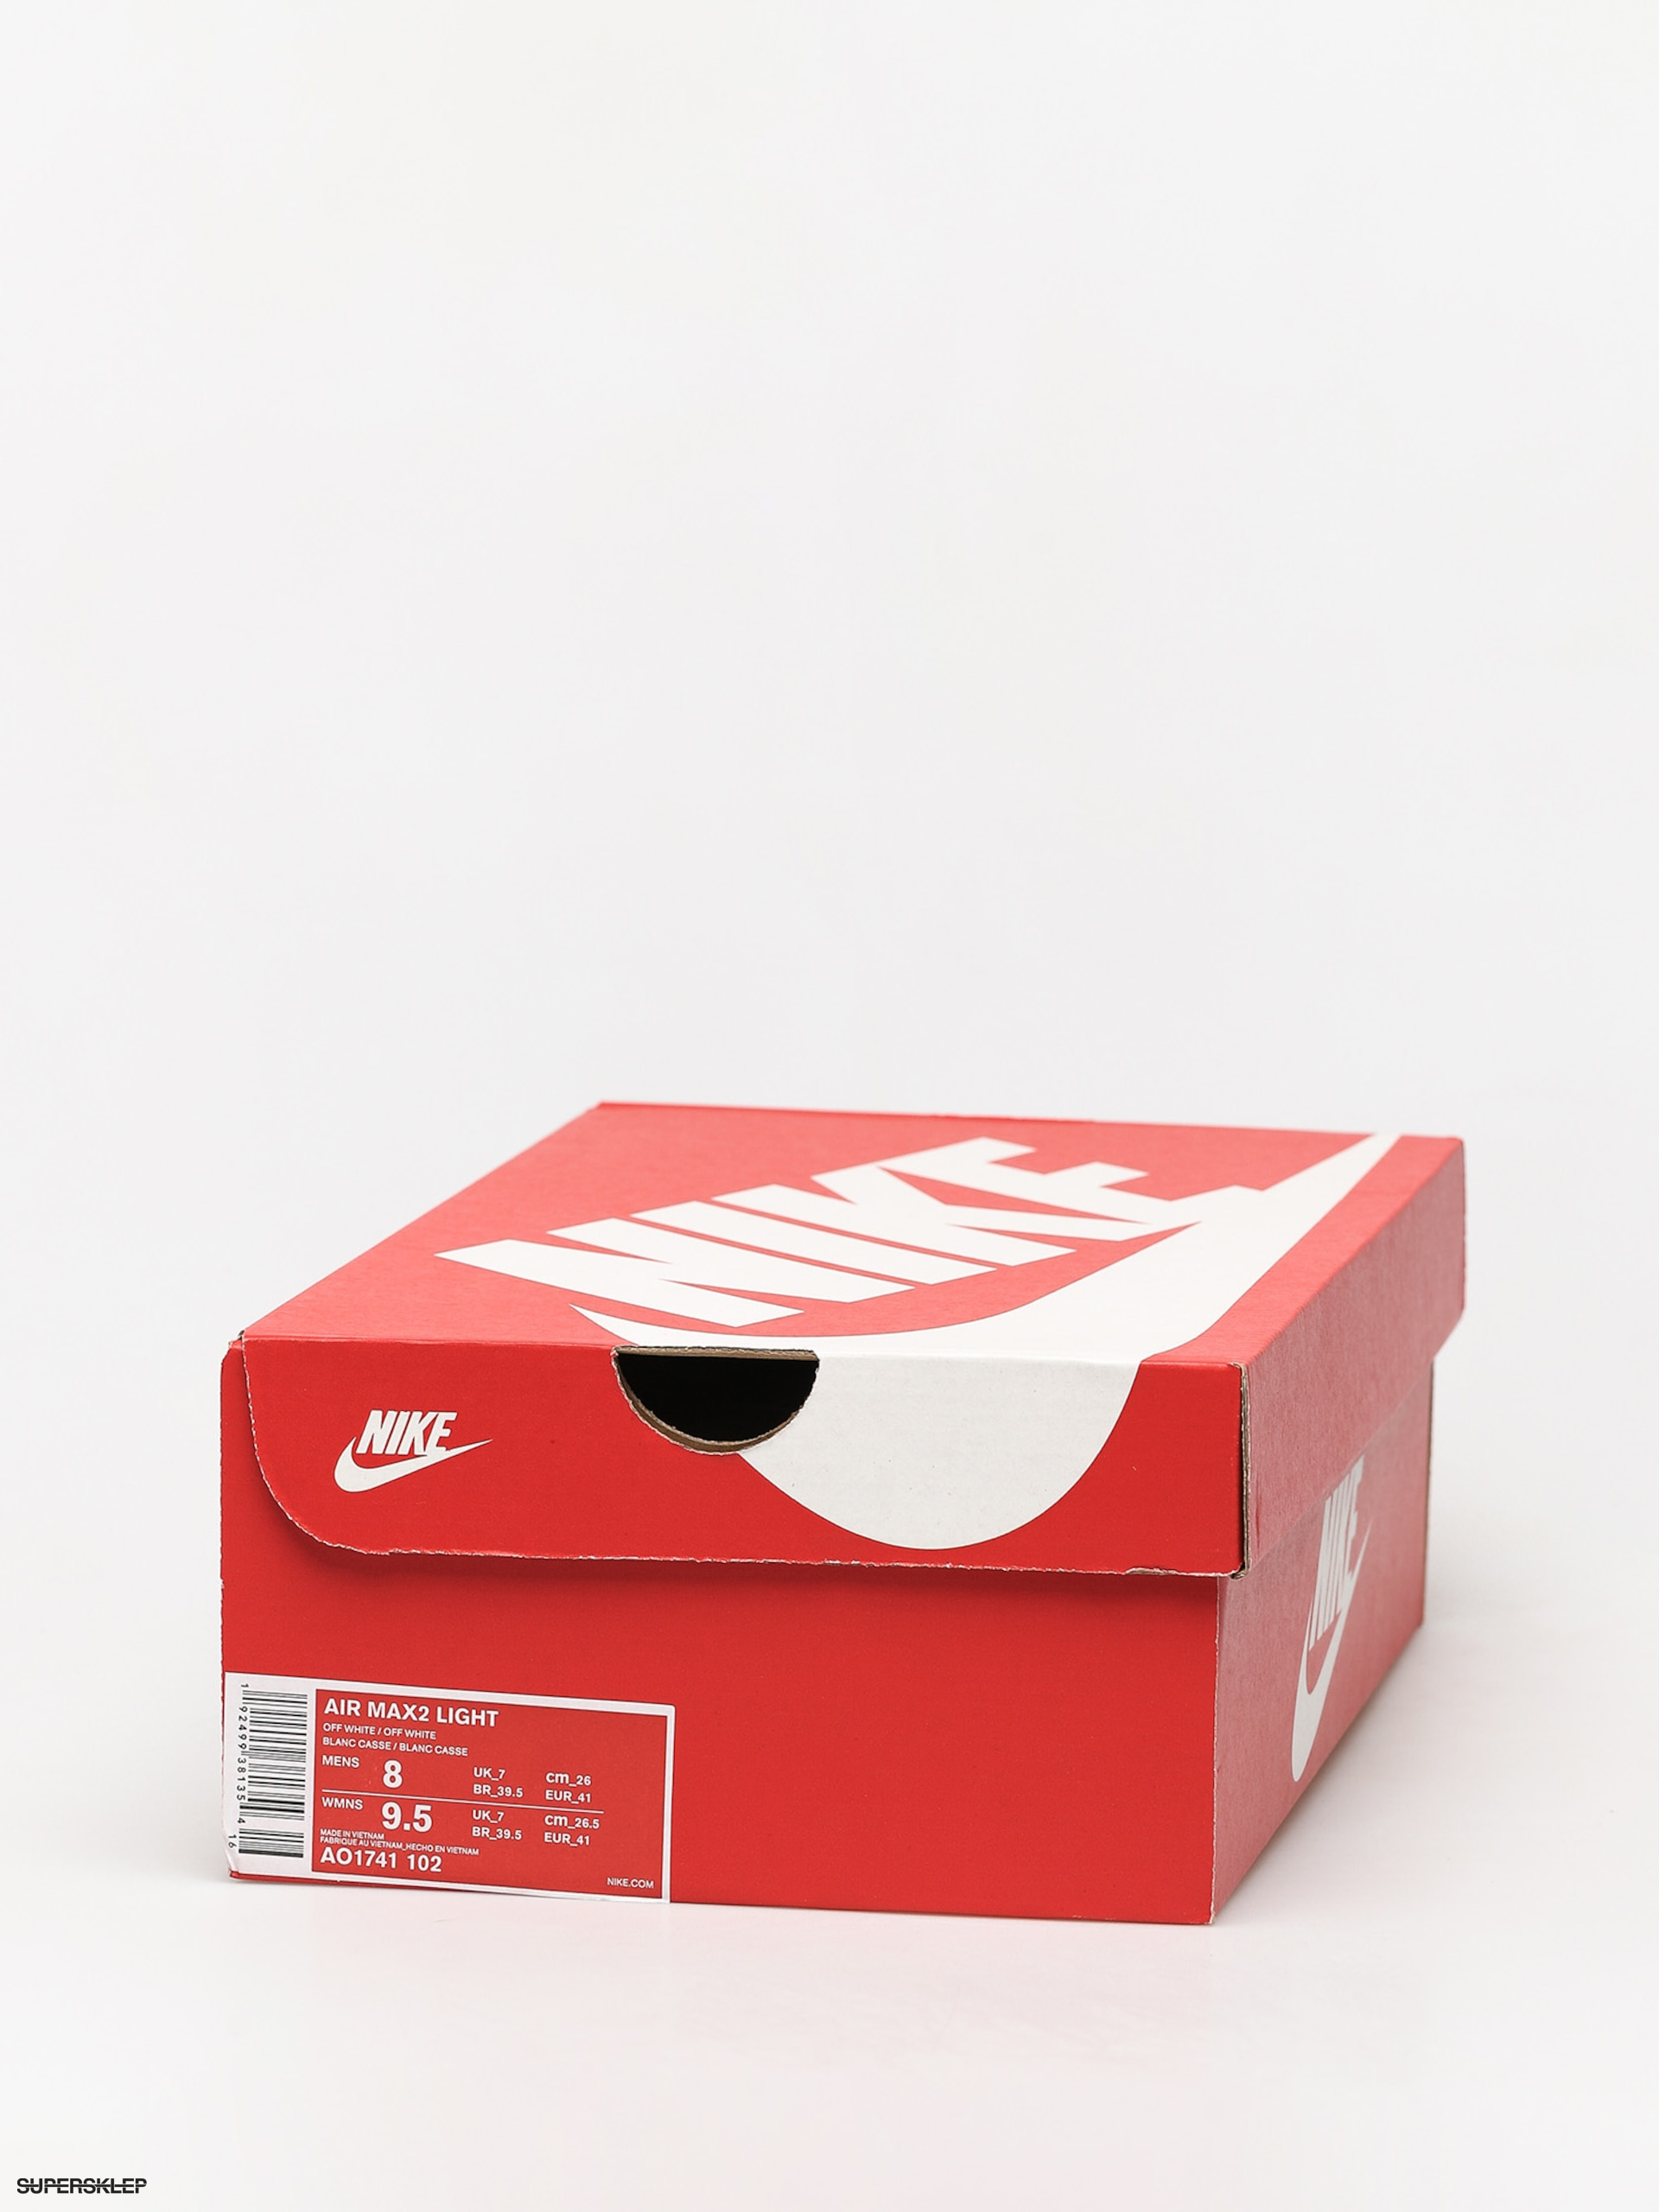 Nike Air Max2 Light Off White (AO1741 102)